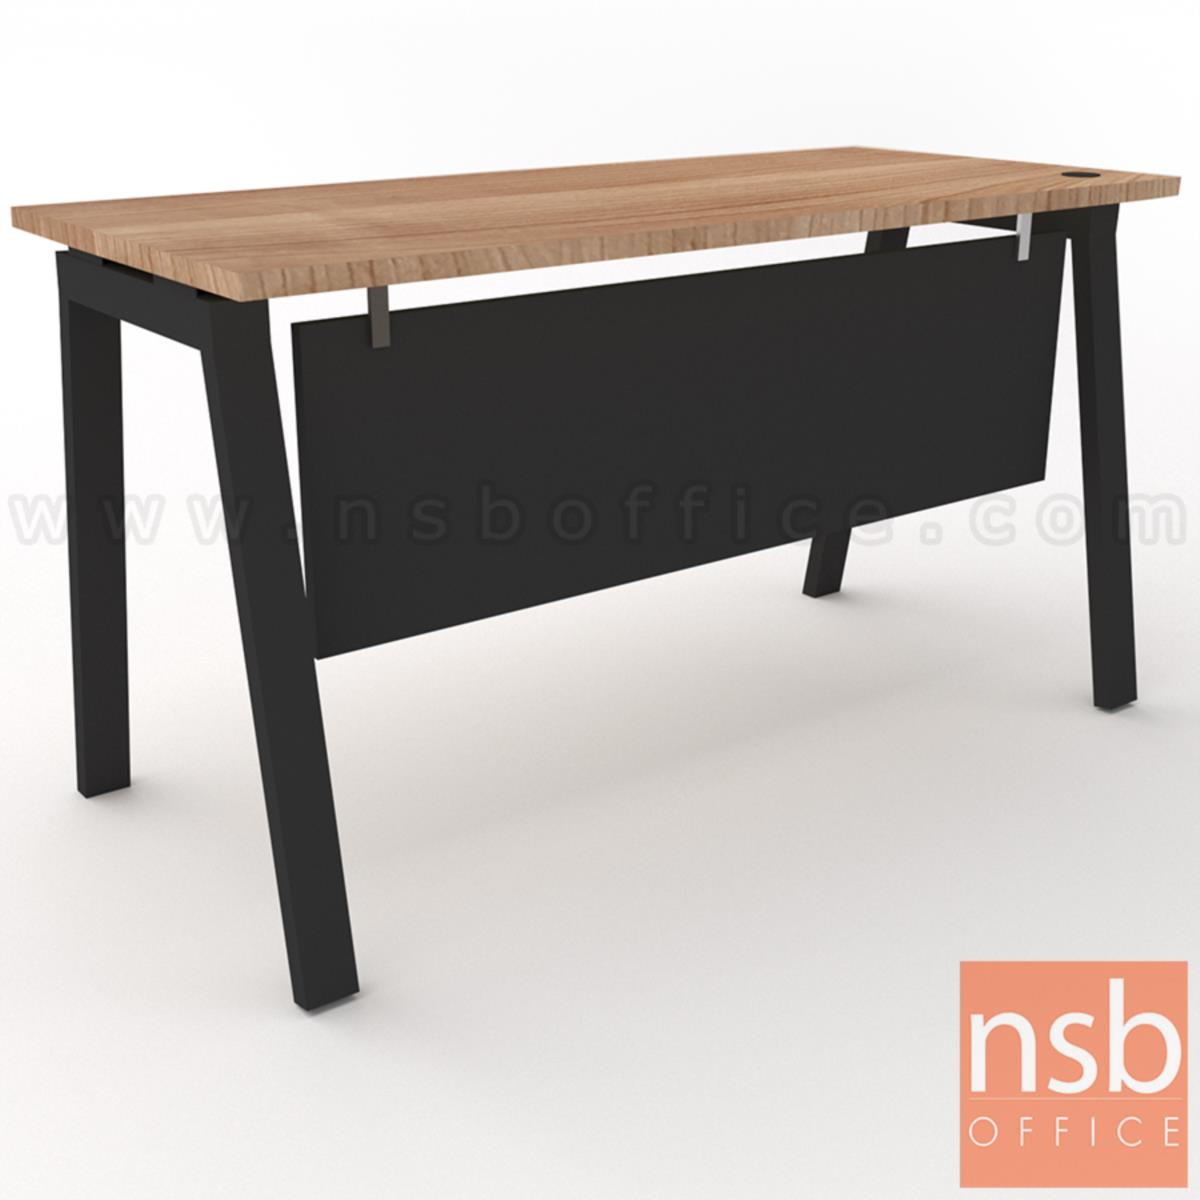 A10A101:โต๊ะทำงานทรงสี่เหลี่ยม Slash-1 (สแลช-1) ขนาด 120W, 135W, 150W cm. ขาเหล็ก